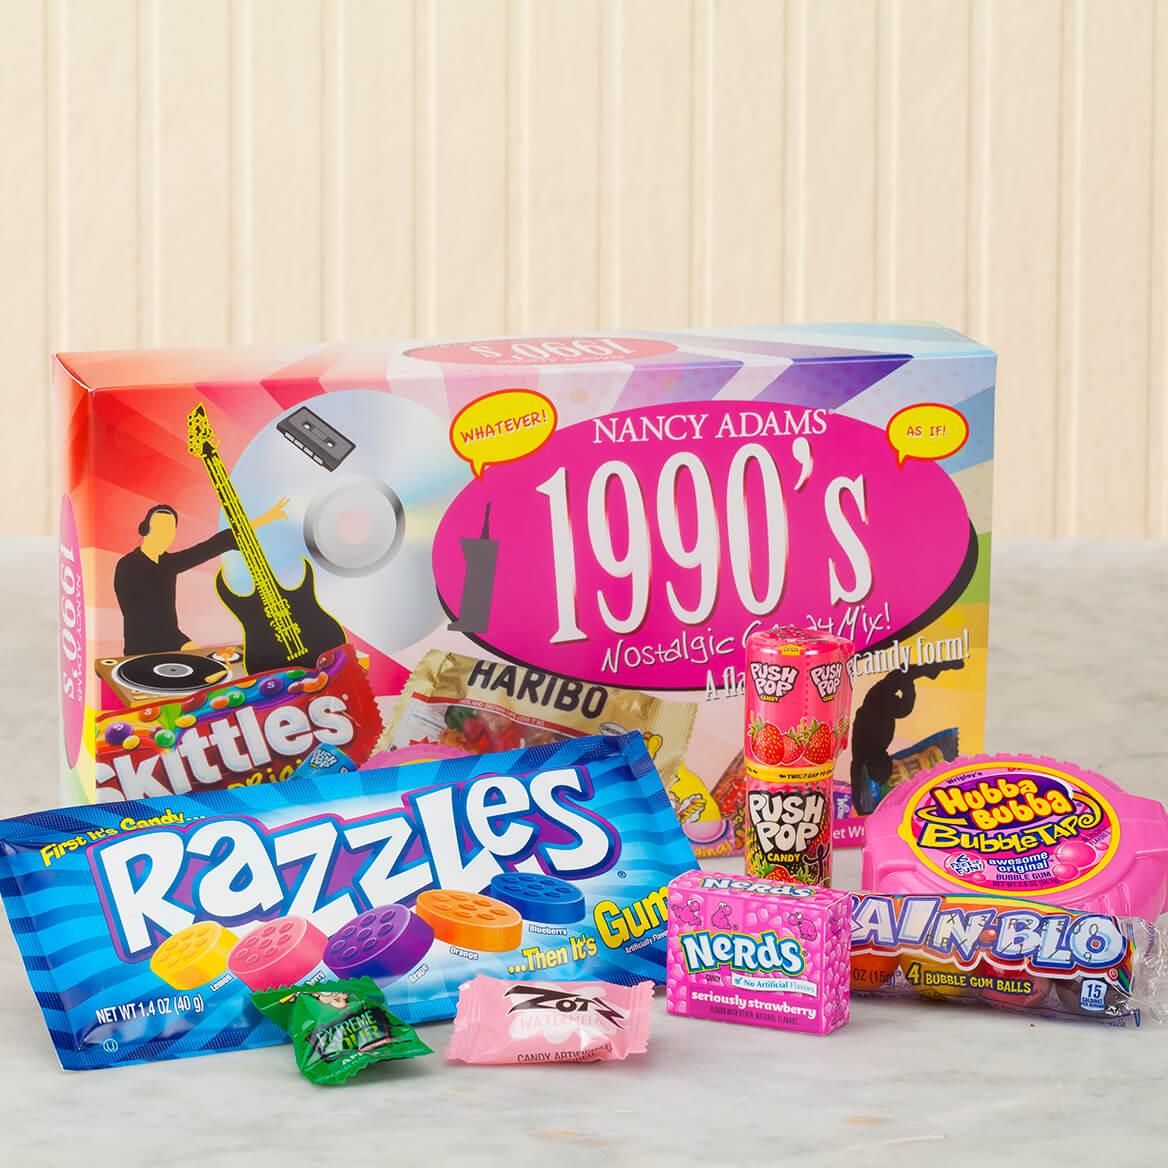 Nostaligic Candy - Fudge - Nuts -Hard Candy - Walter Drake